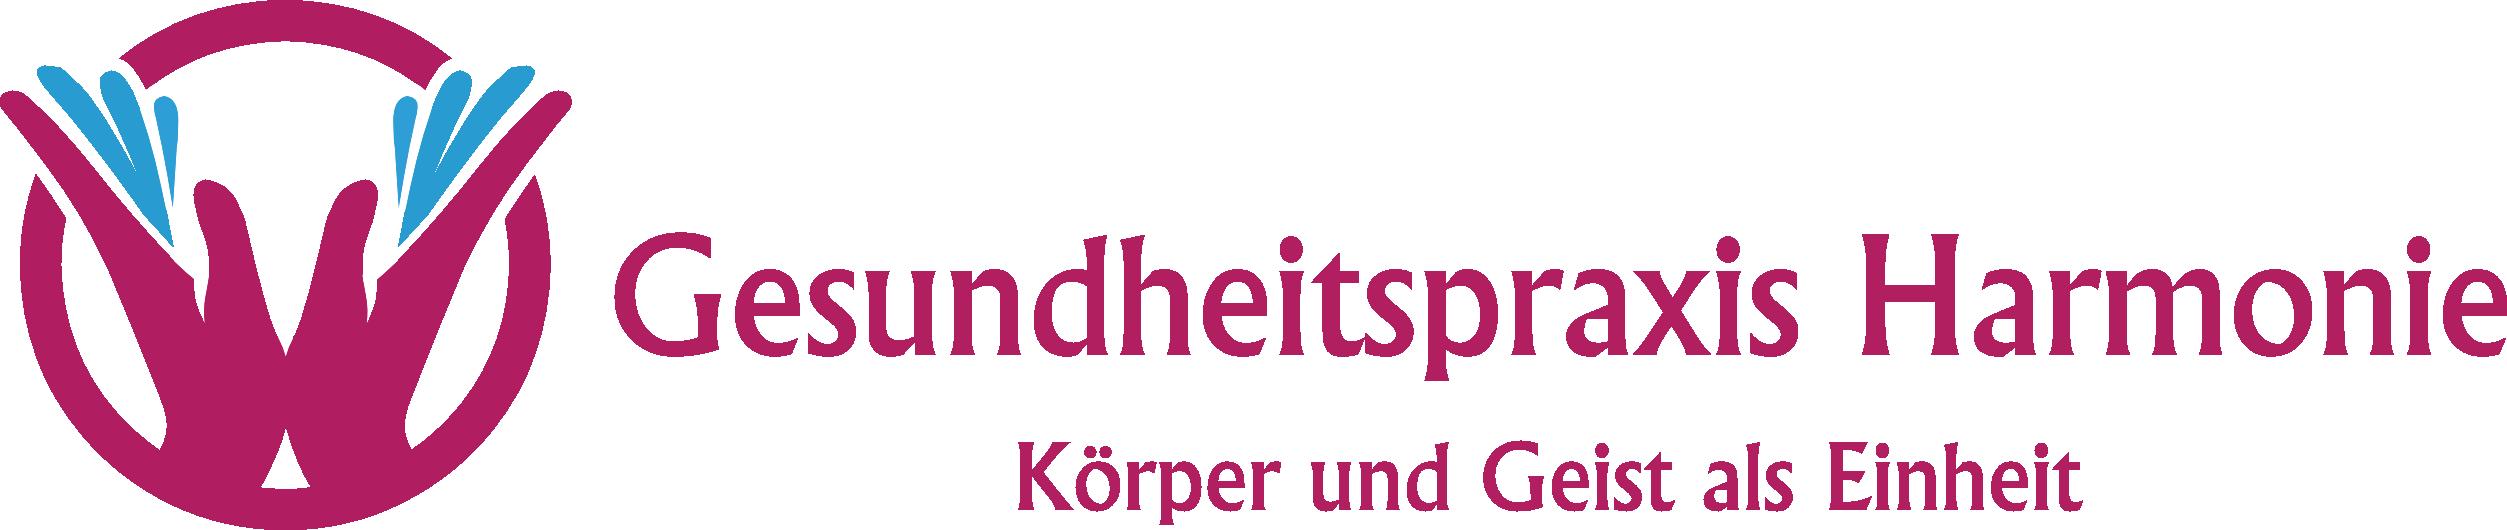 Gesundheitspraxis Harmonie Logo